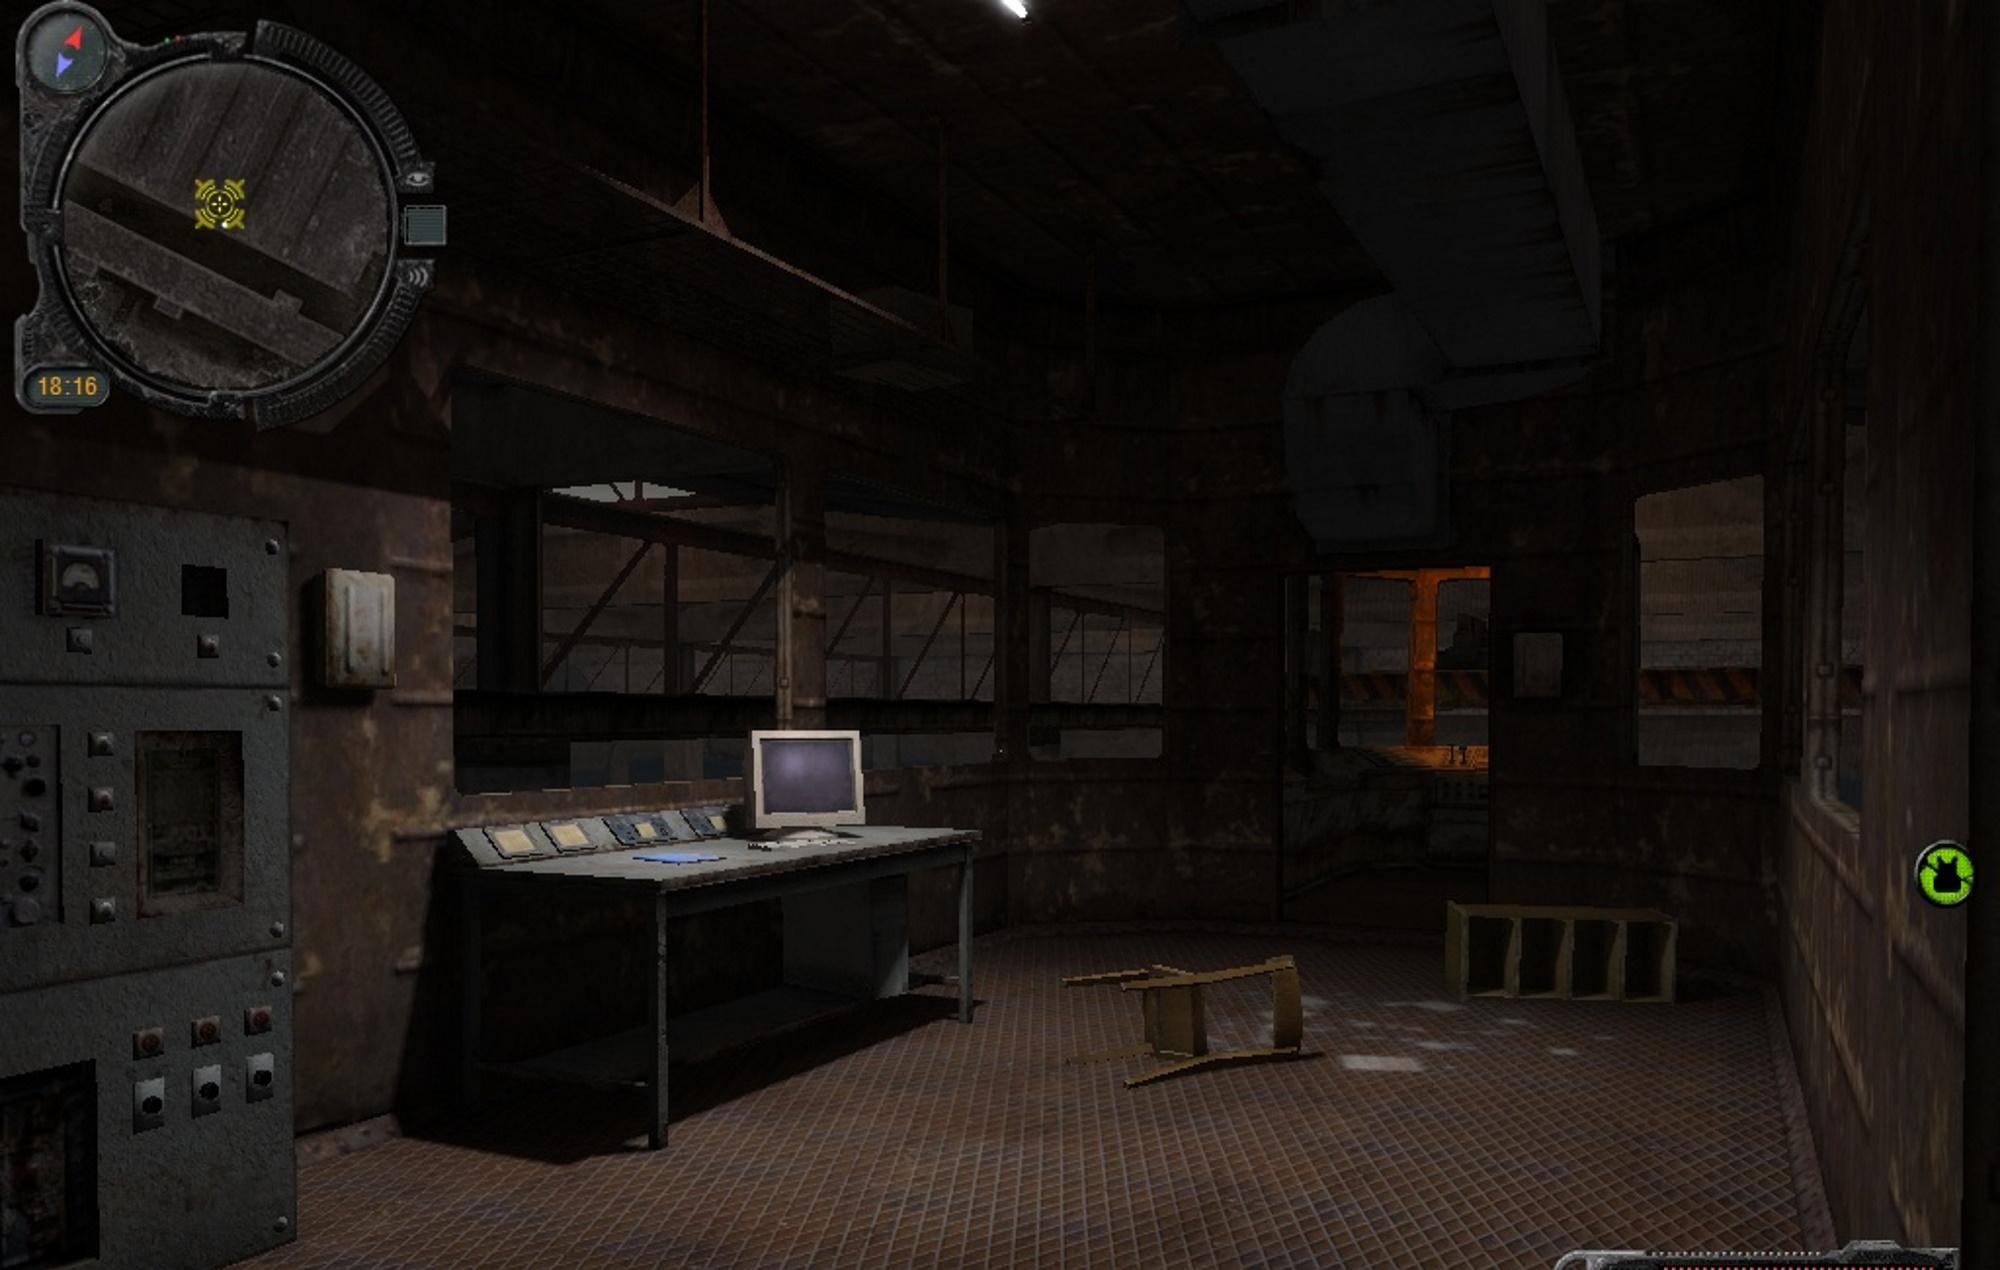 S.T.A.L.K.E.R. 2: Call of Pripyat